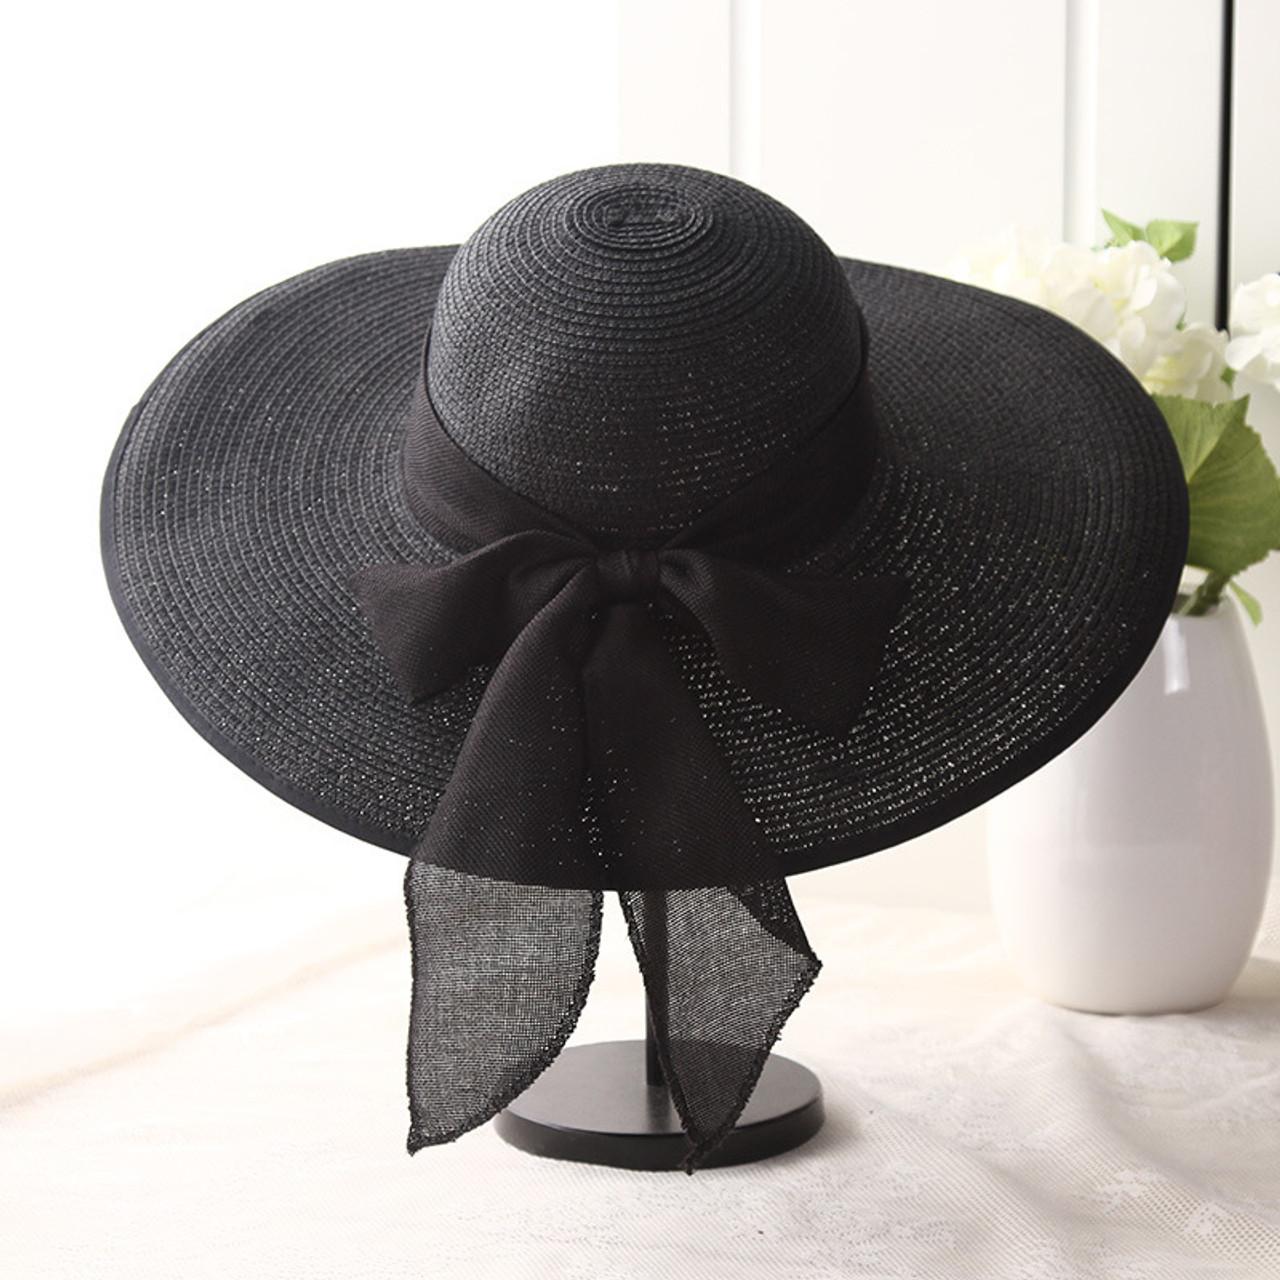 4a4dbba6 ... USPOP 2019 fashion women sun hats hand made straw hat female ribbon  bow-knot wide ...